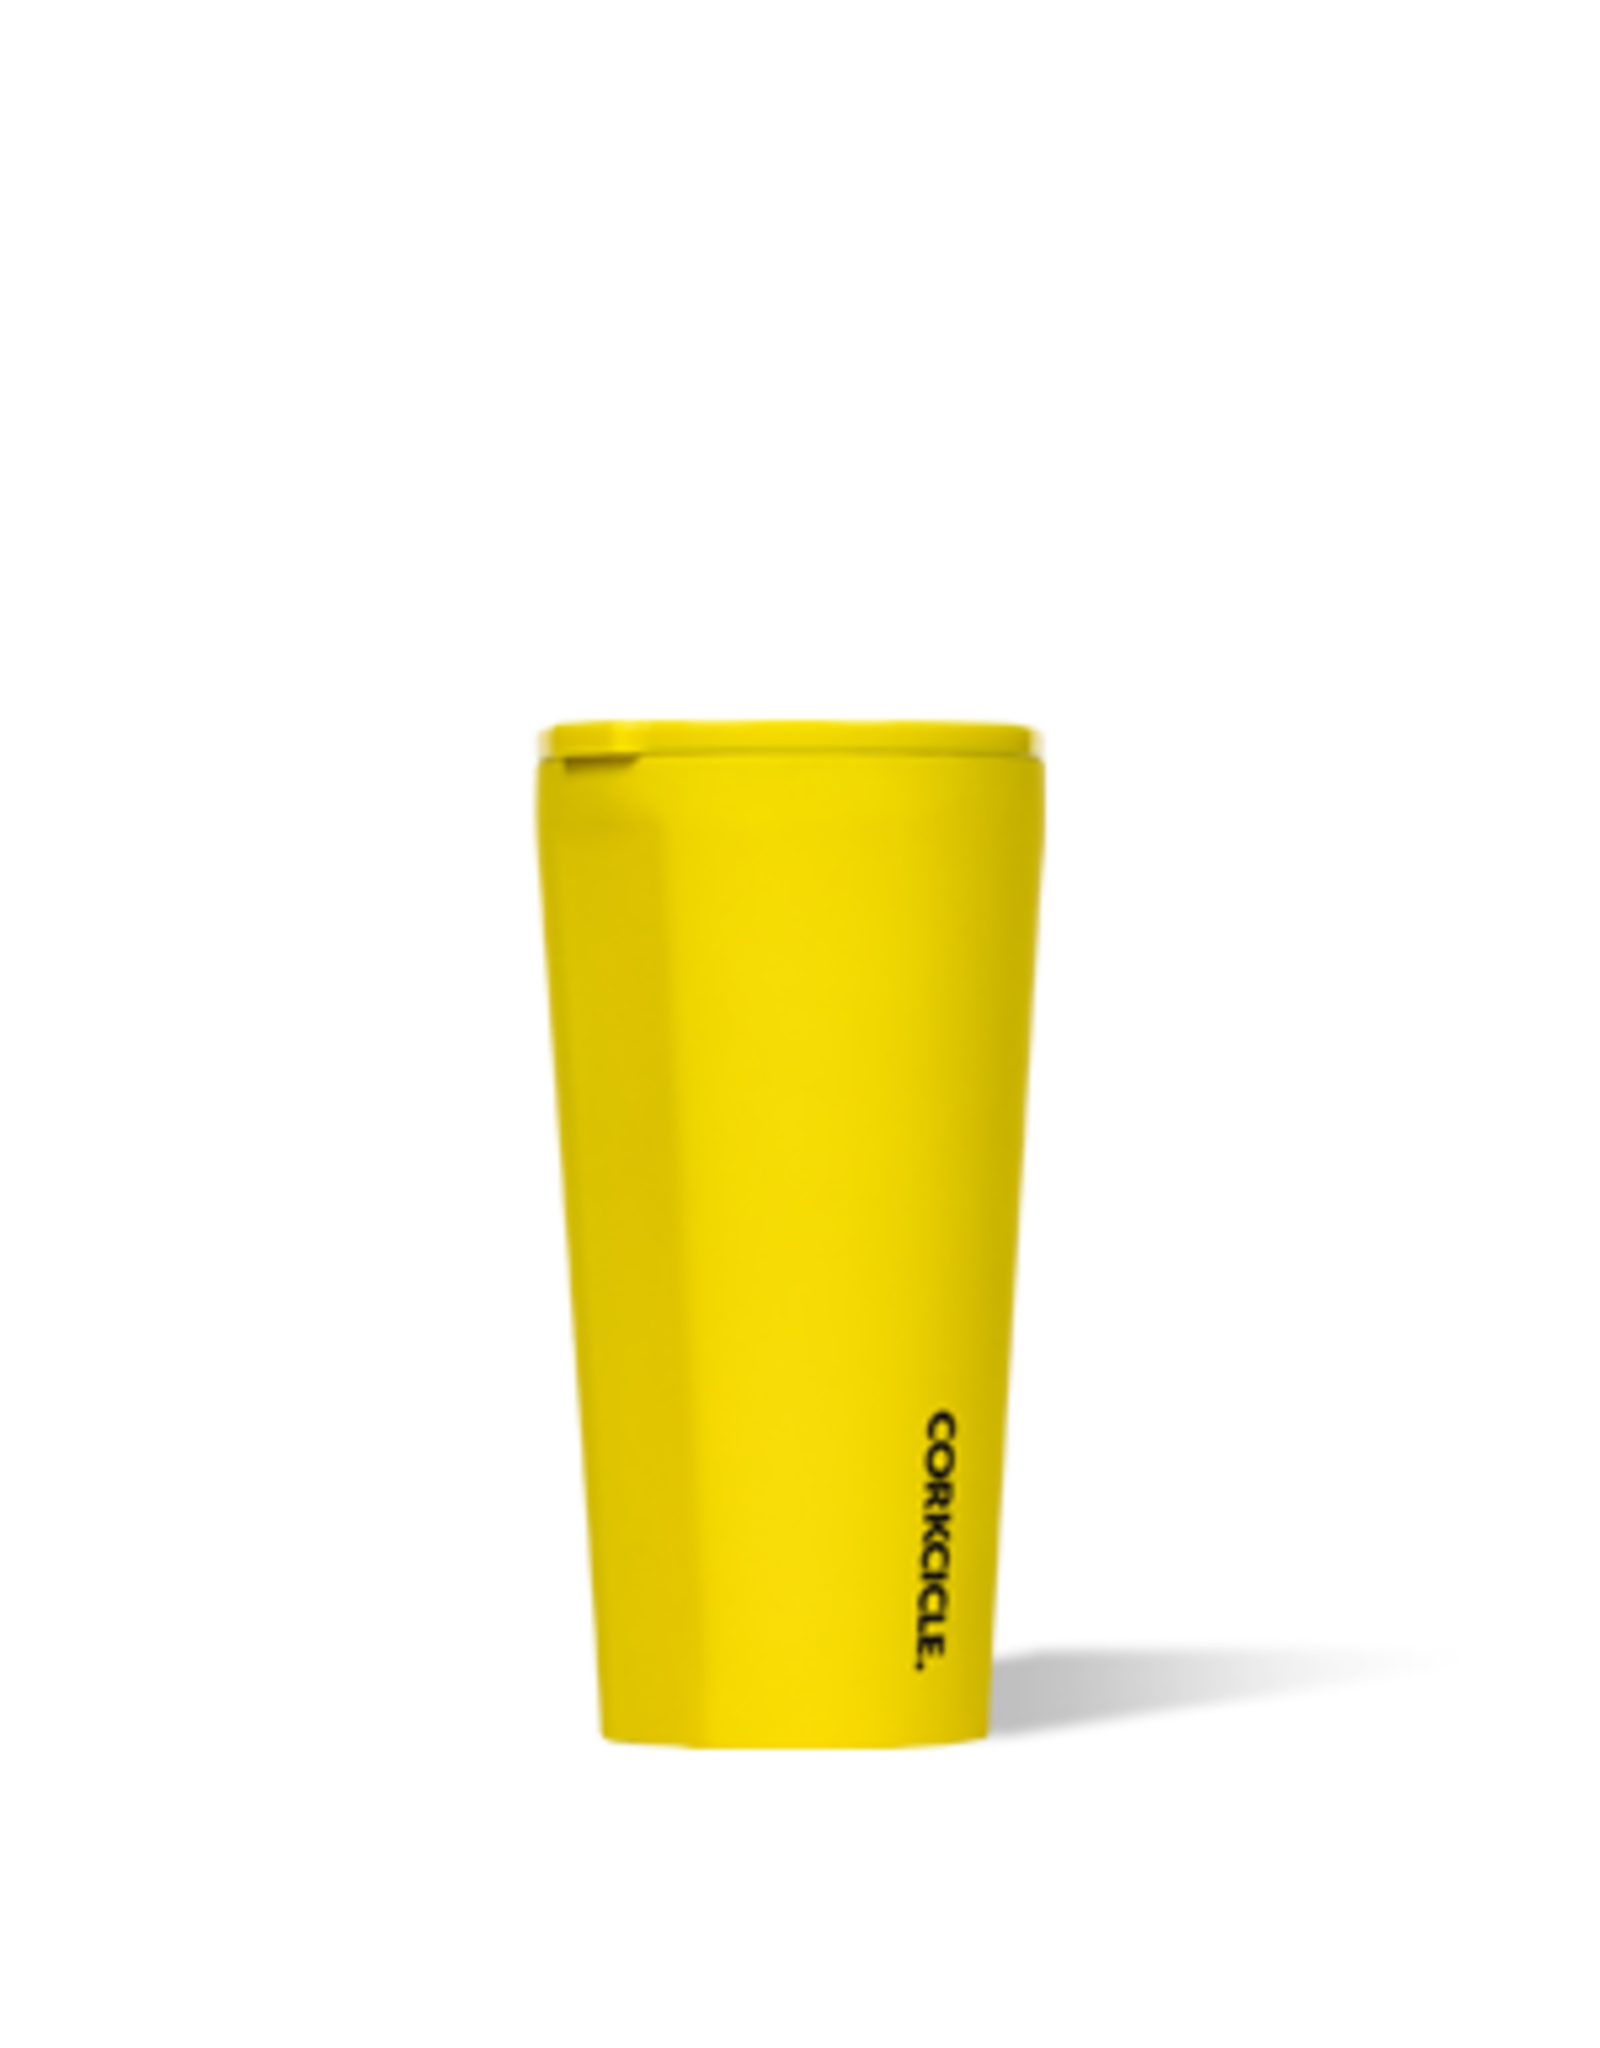 Corkcicle Tumbler - 16oz Neon Lights Neon Yellow